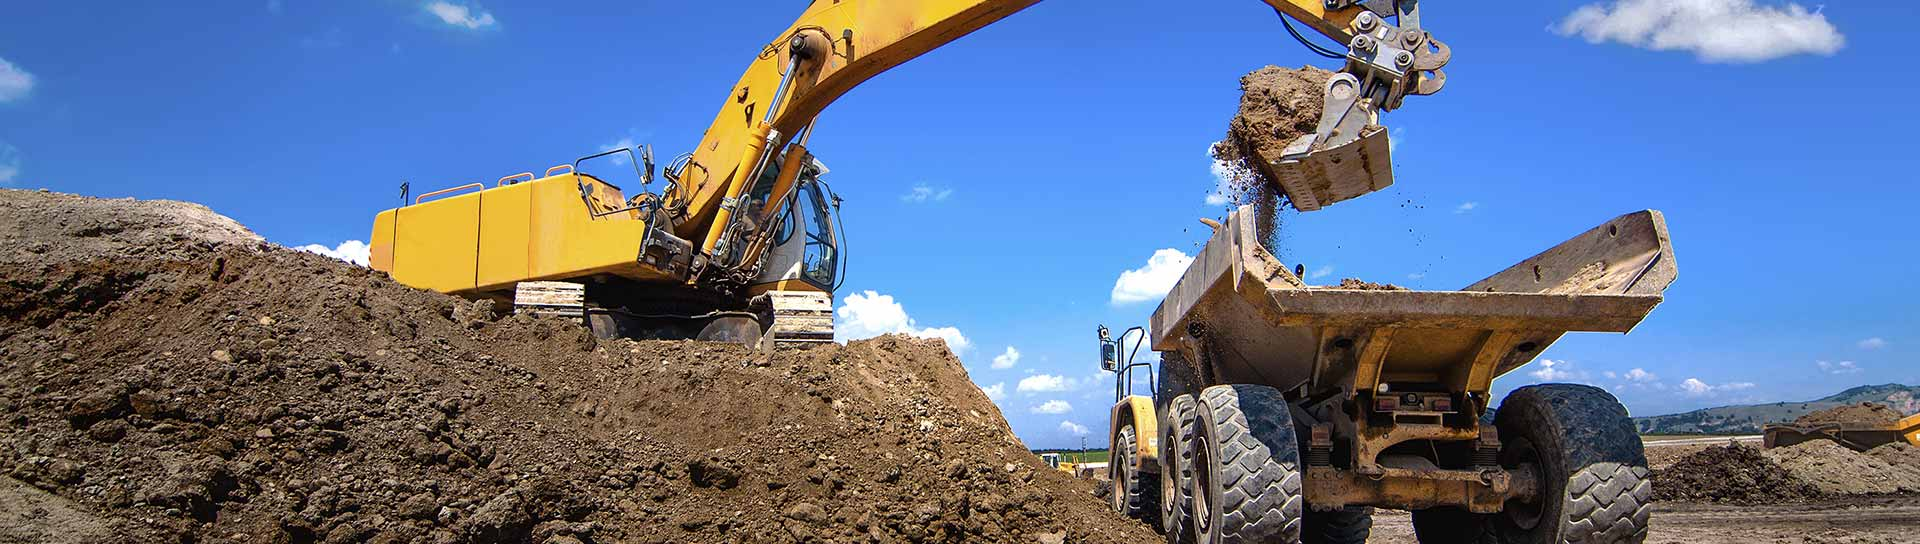 yellow excavator digging